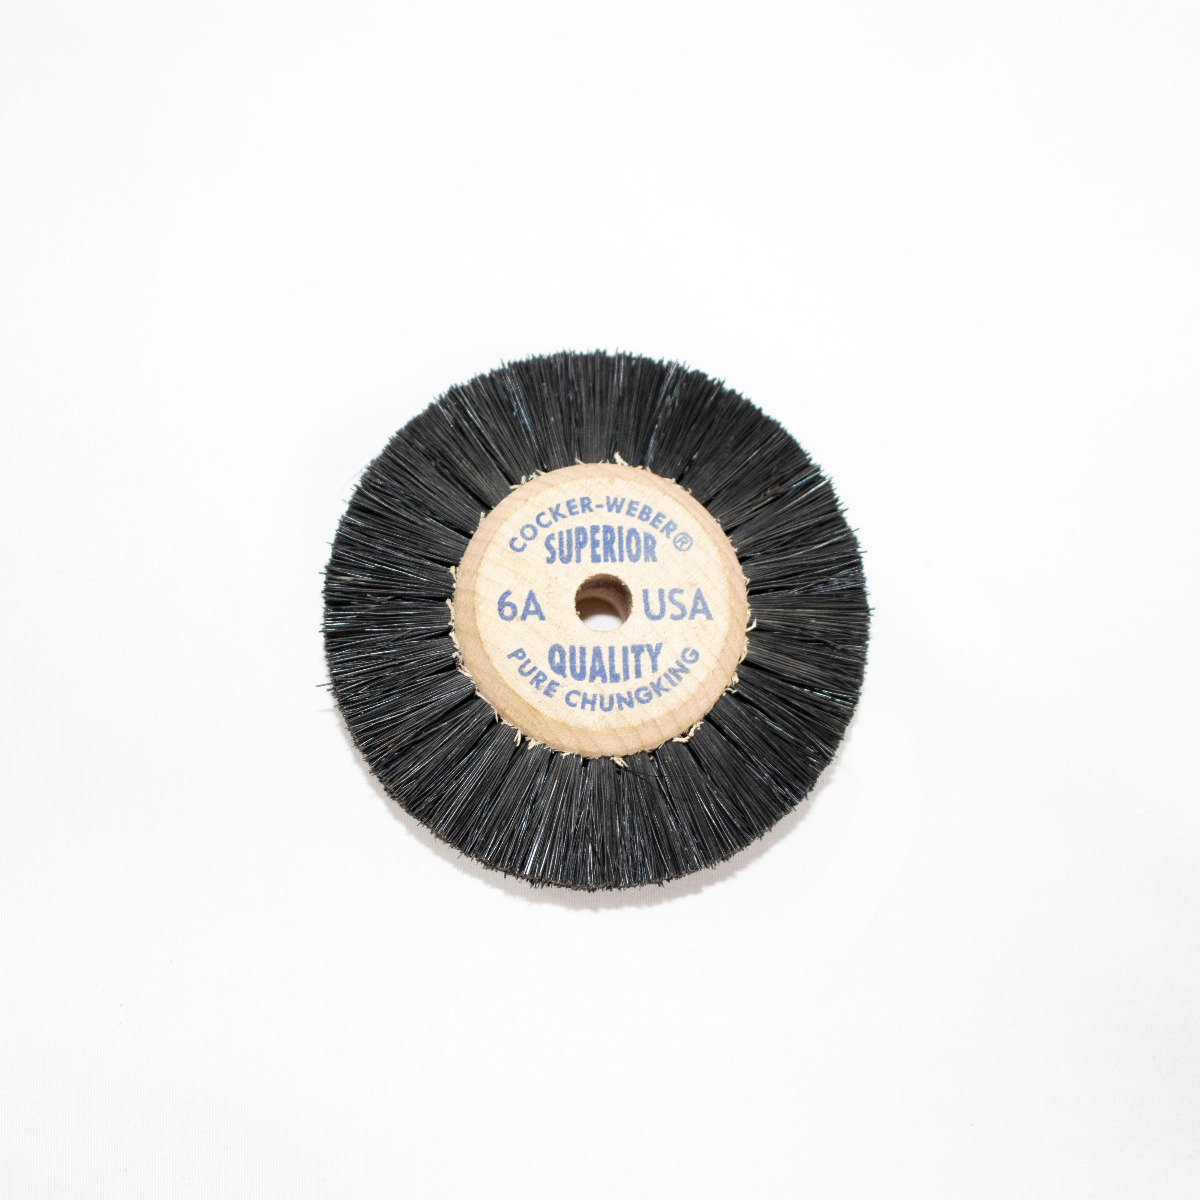 "6-A Blue Label Cocker Weber Brushes, 5/8"" Trim Hair"